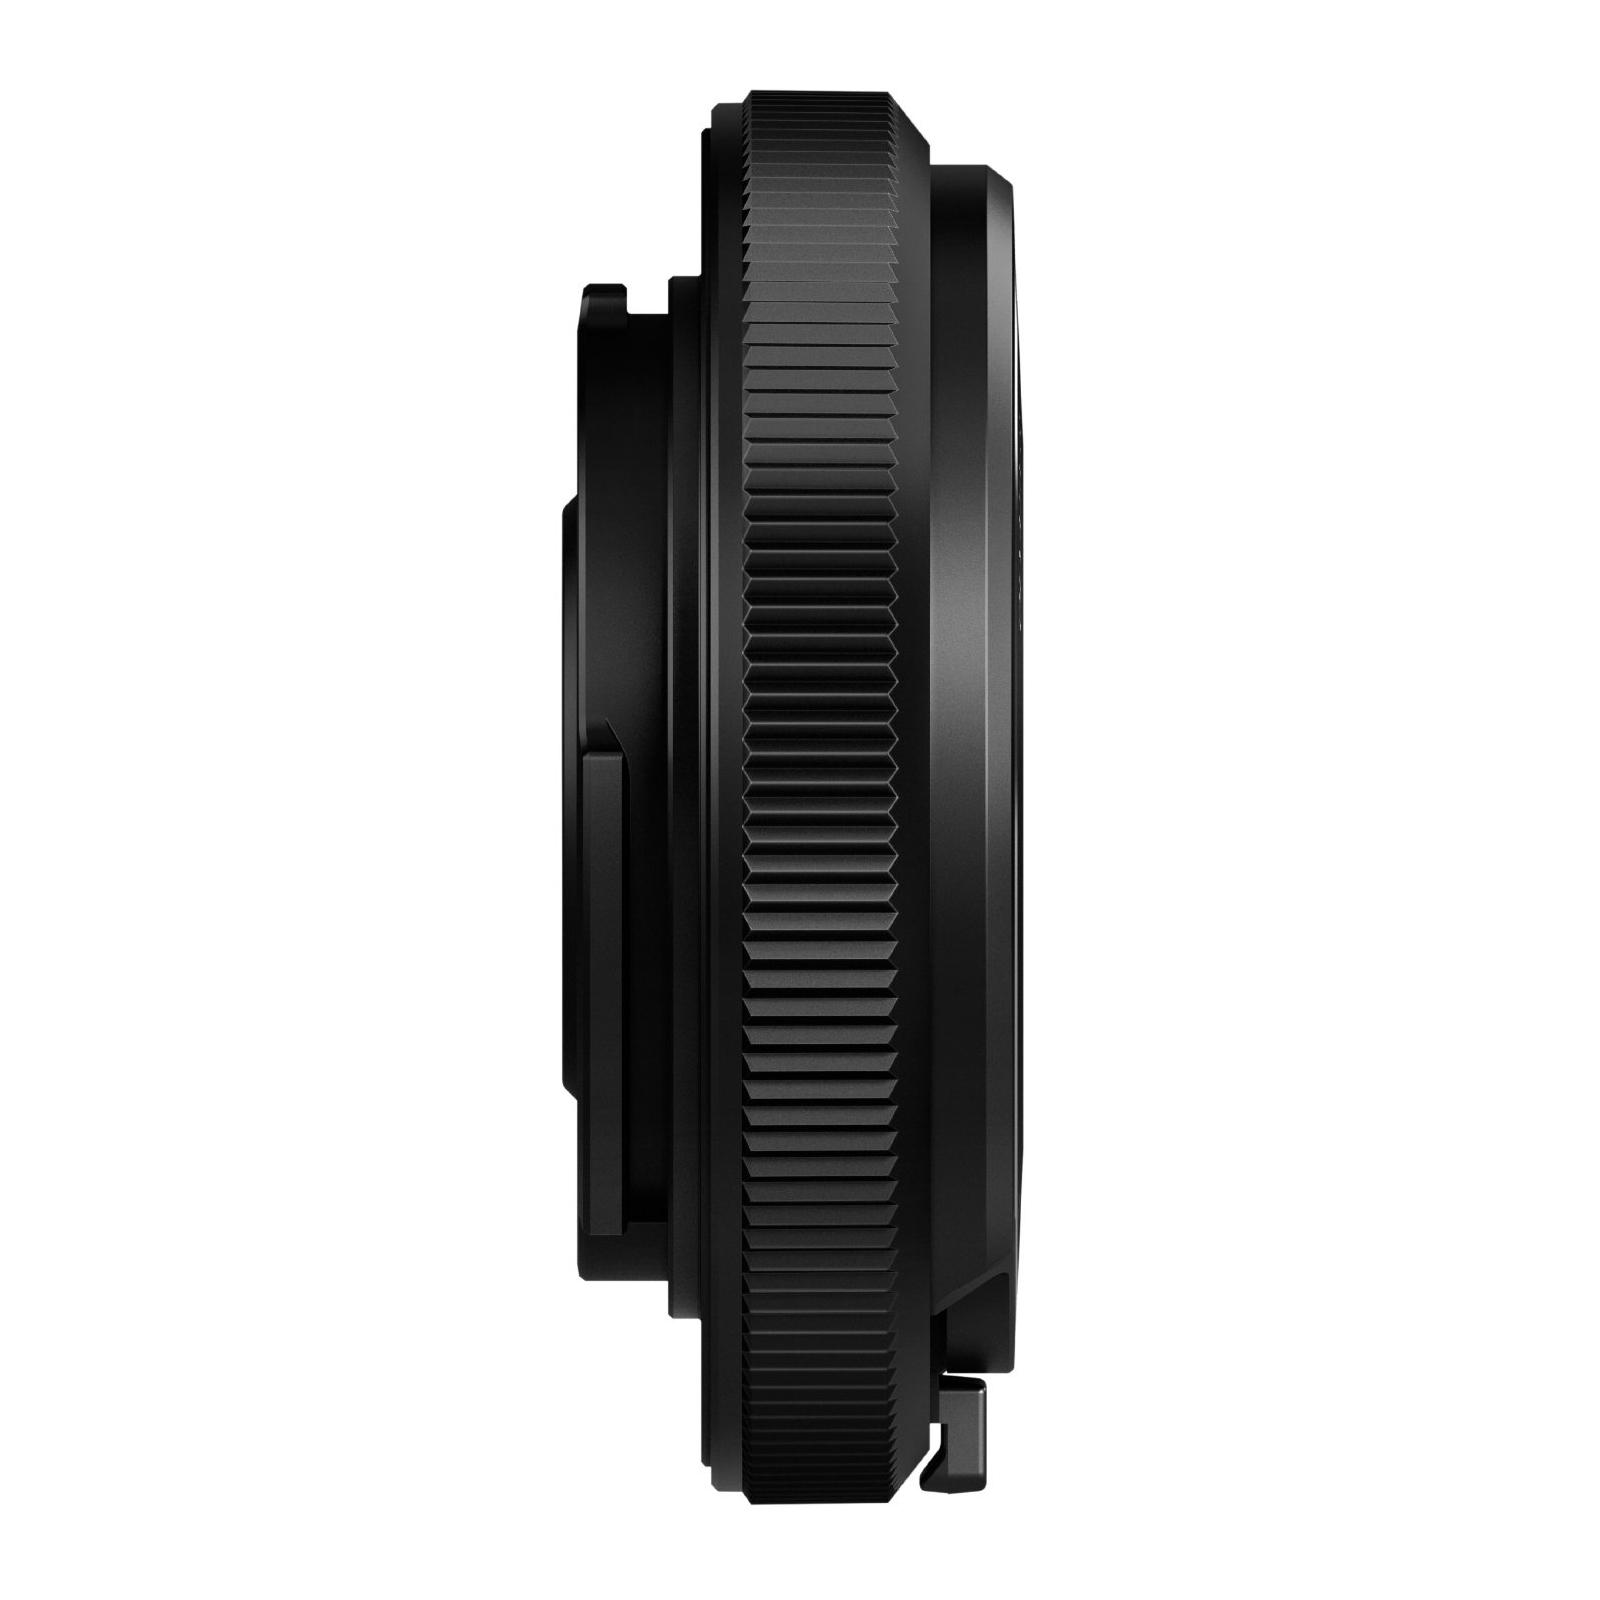 Объектив OLYMPUS BCL-0980 Fish-Eye Body Cap Lens 9mm 1:8.0 Black (V325040BW000) изображение 2